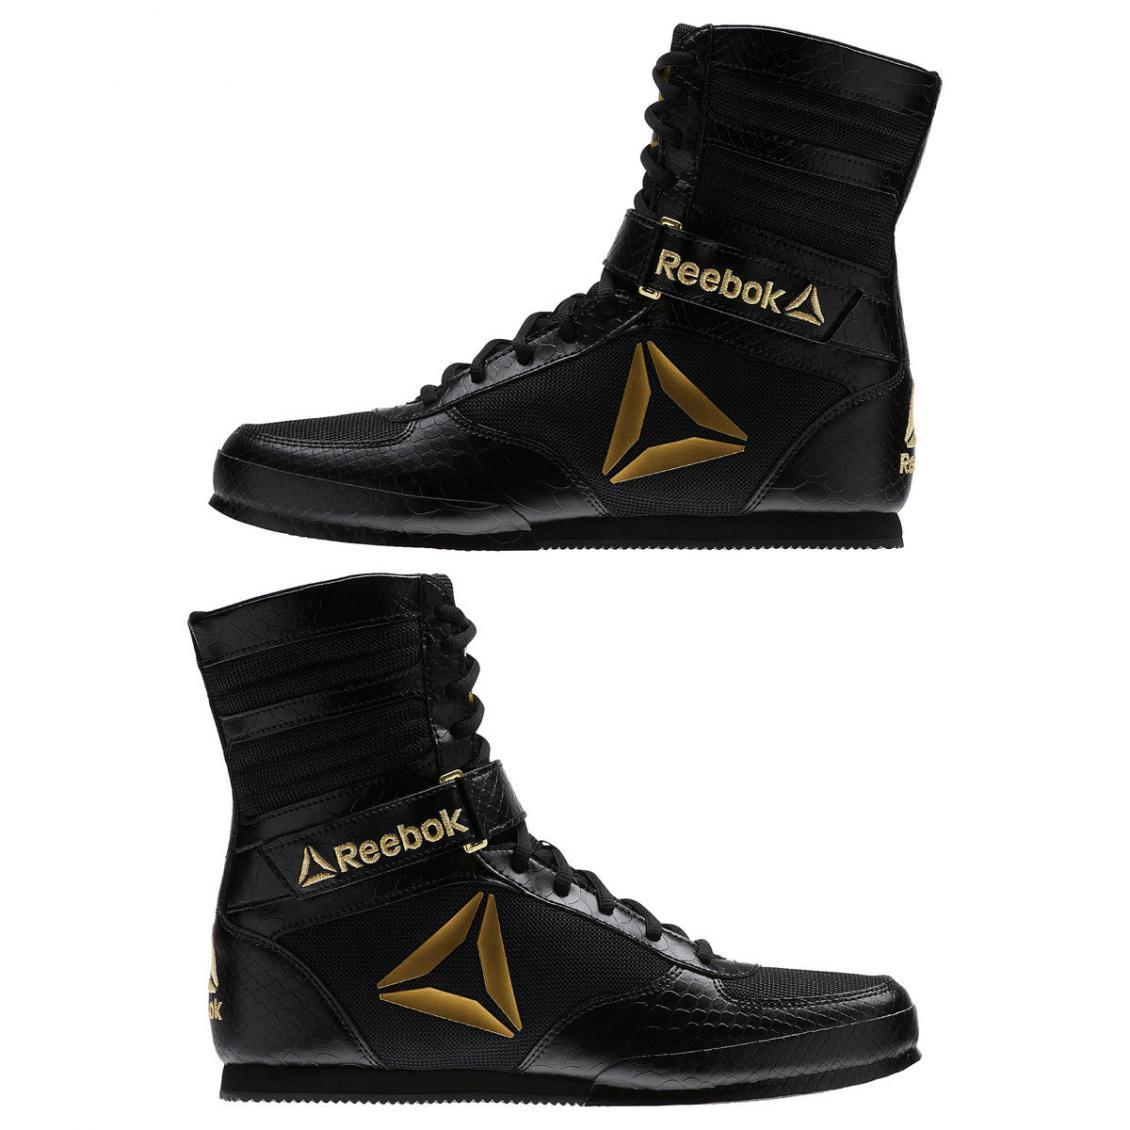 palo Amplificar Aparador  reebok boxing boot buck - 51% remise - www.muminlerotomotiv.com.tr